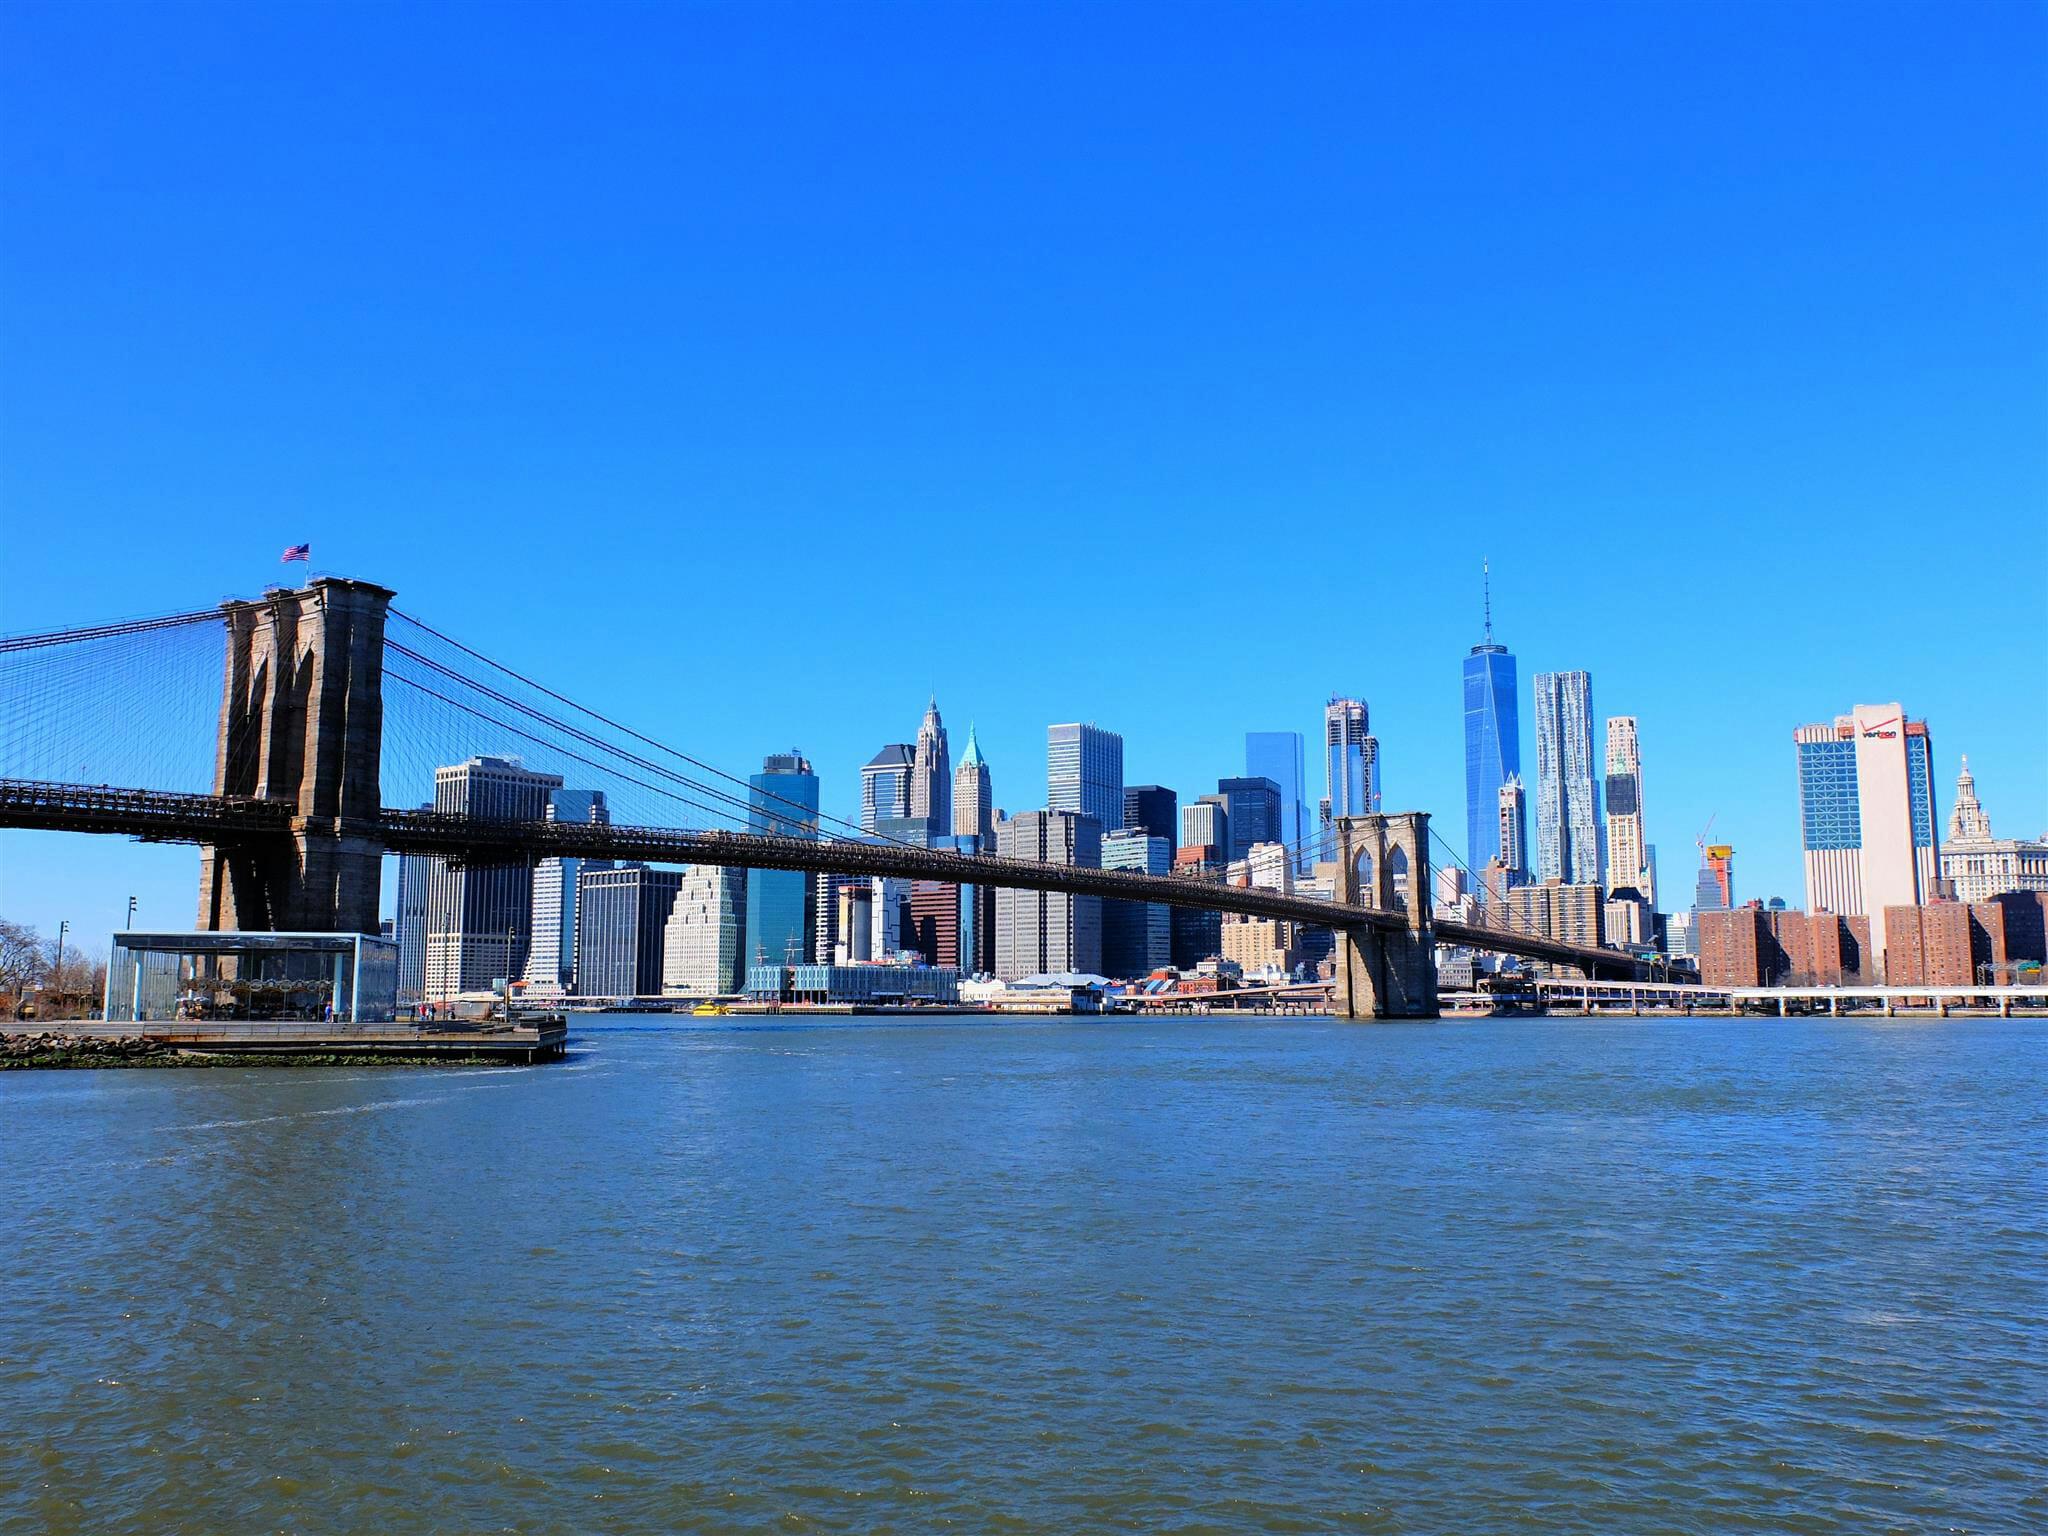 Brooklyn Bridge and NYC Skyline High Quality Wallpaper